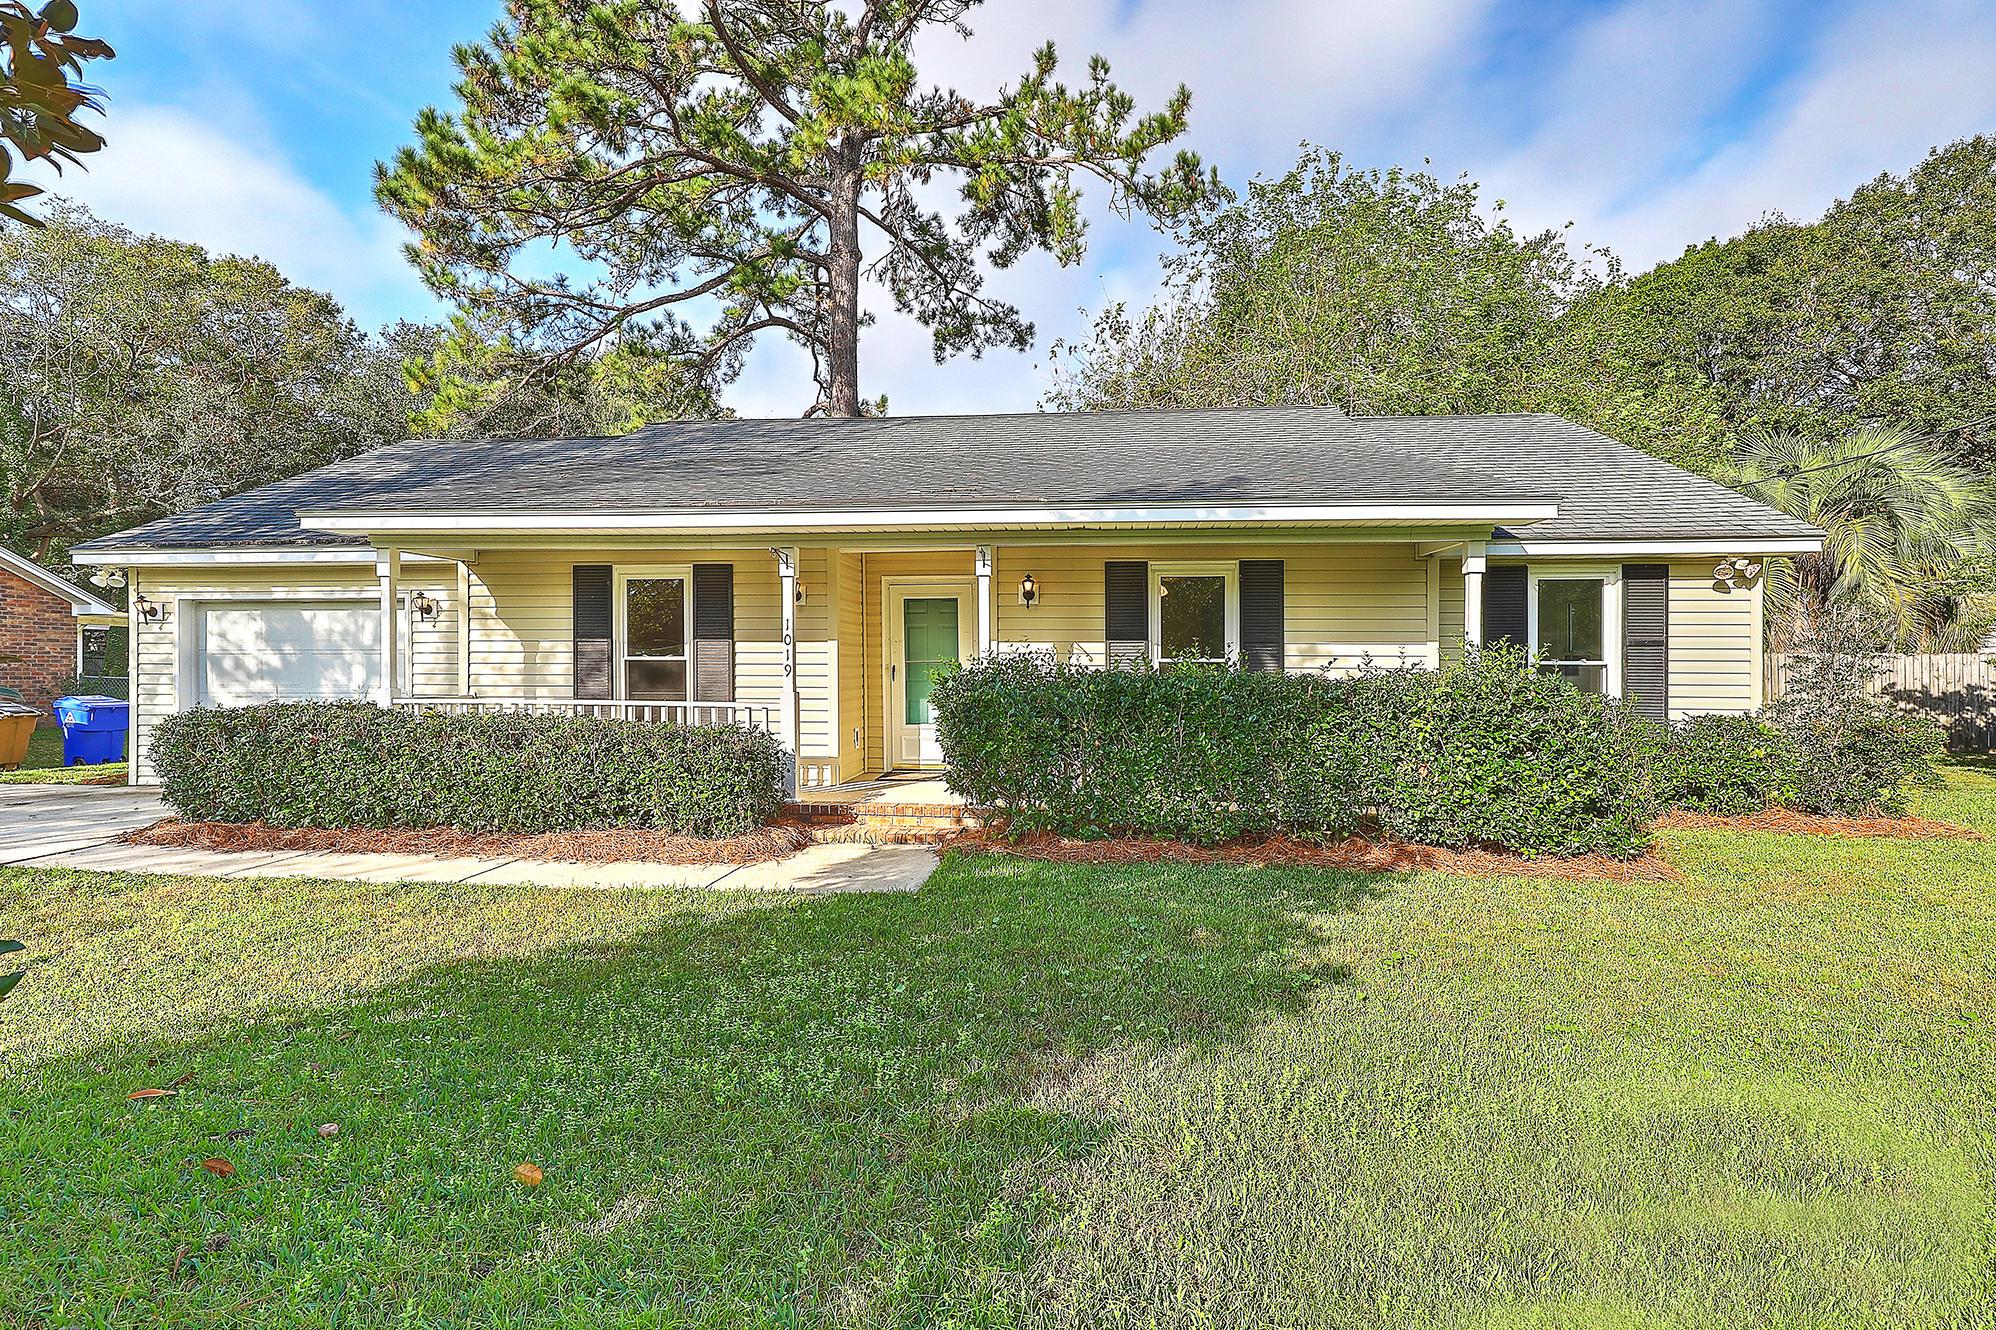 Lynwood Homes For Sale - 1019 Arborwood, Charleston, SC - 0